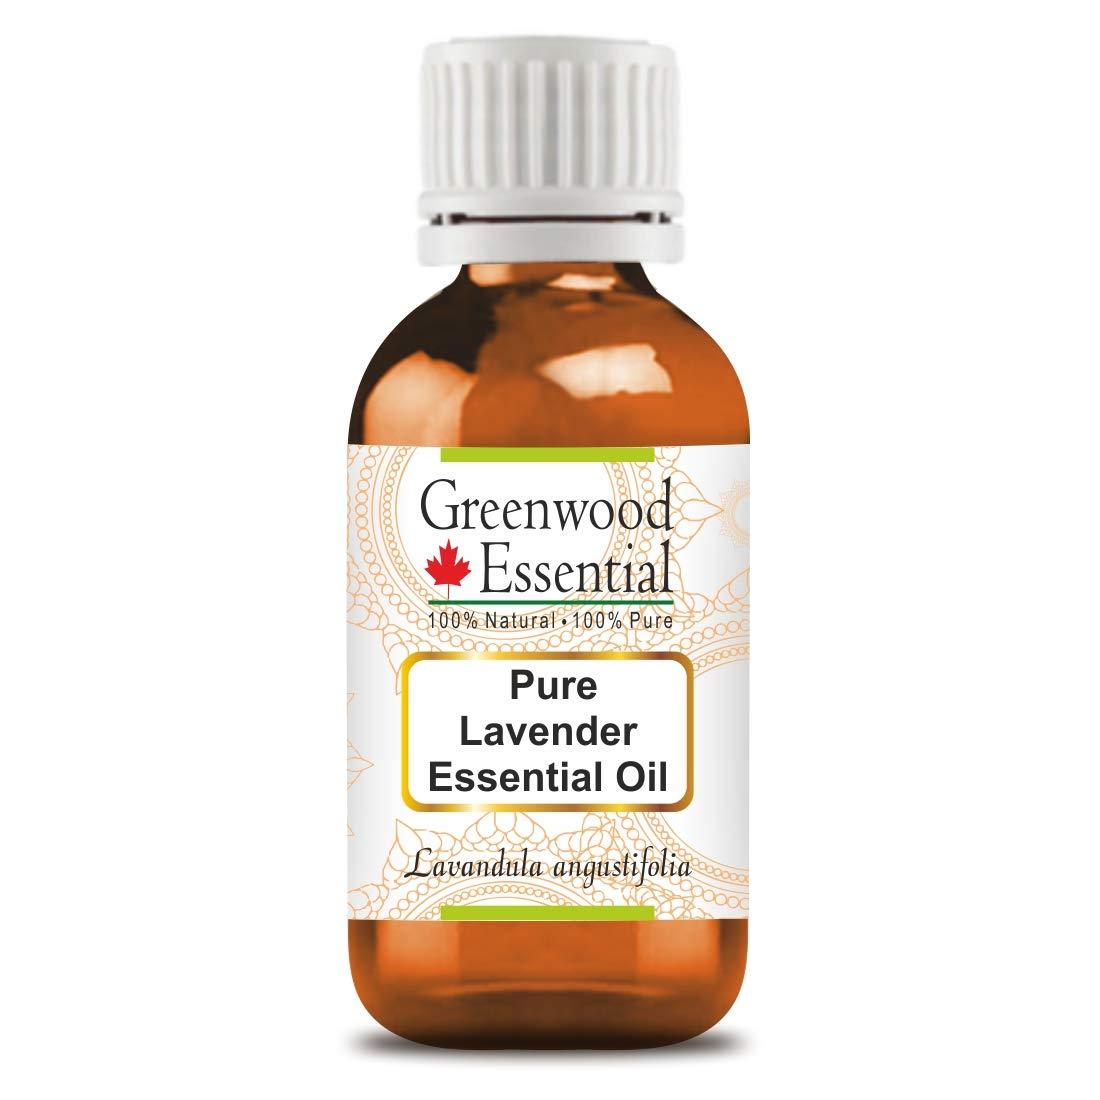 Greenwood Essential Pure Lavender Essential Oil (Lavandula angustifolia) 100% Natural Therapeutic Grade Steam Distilled 15ml (0.50 oz)